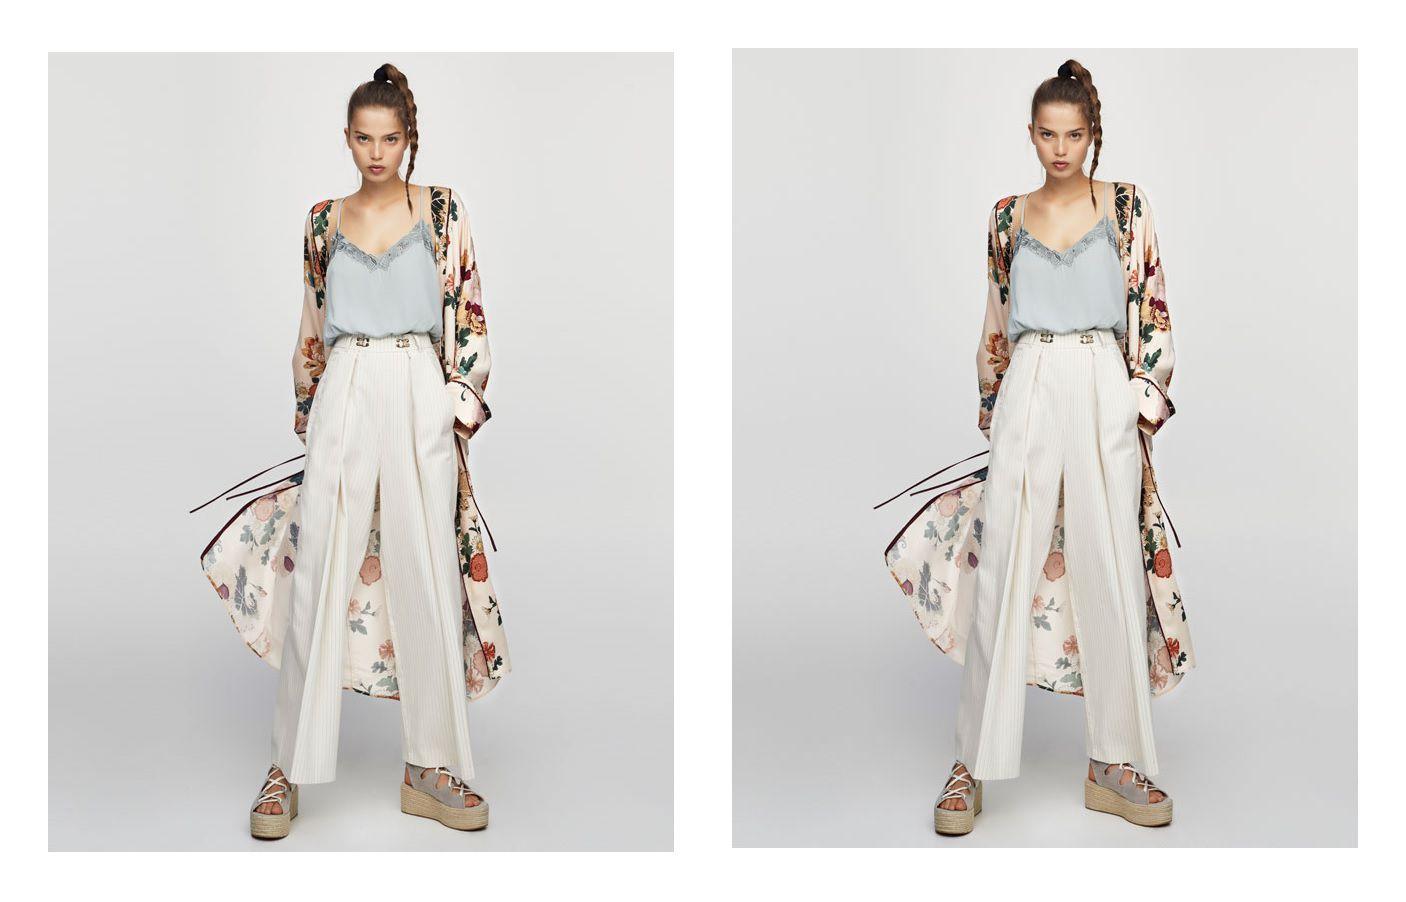 Kombinacija iz Pull&Bear-a koju želimo kopirati: široke hlače i kimono